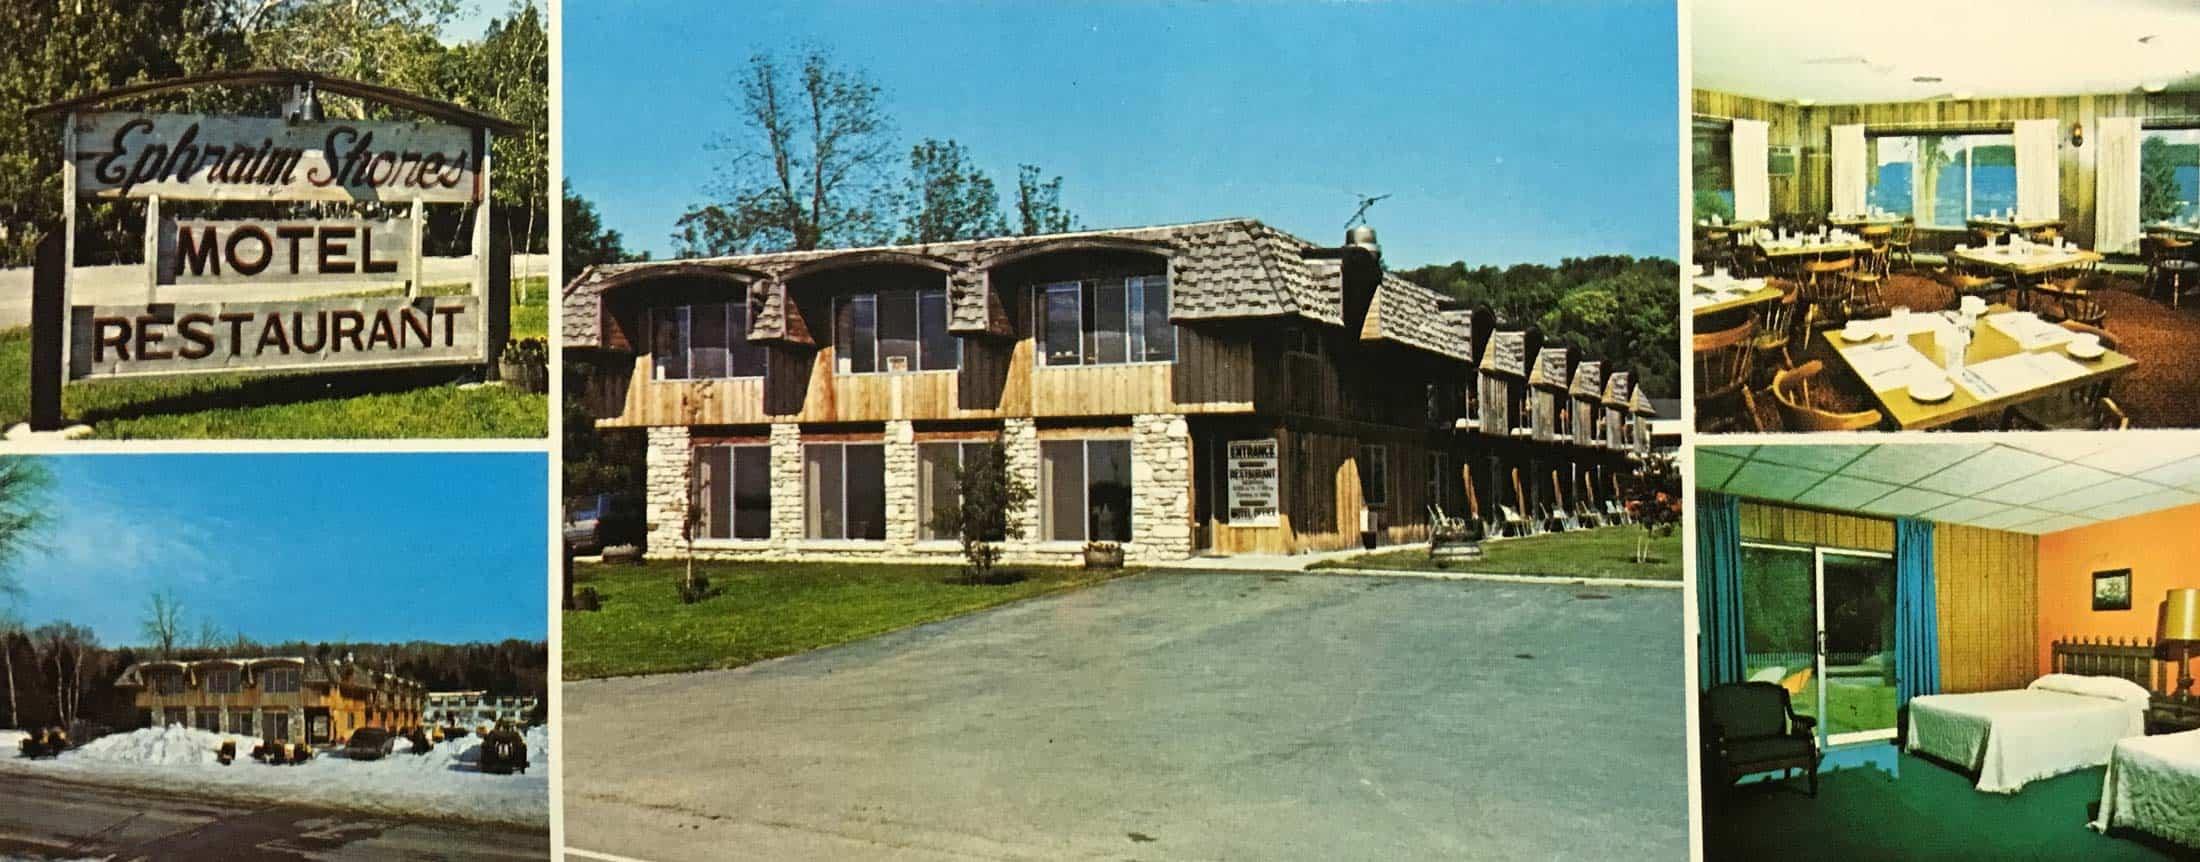 Historical photo of Ephraim Shores Resort